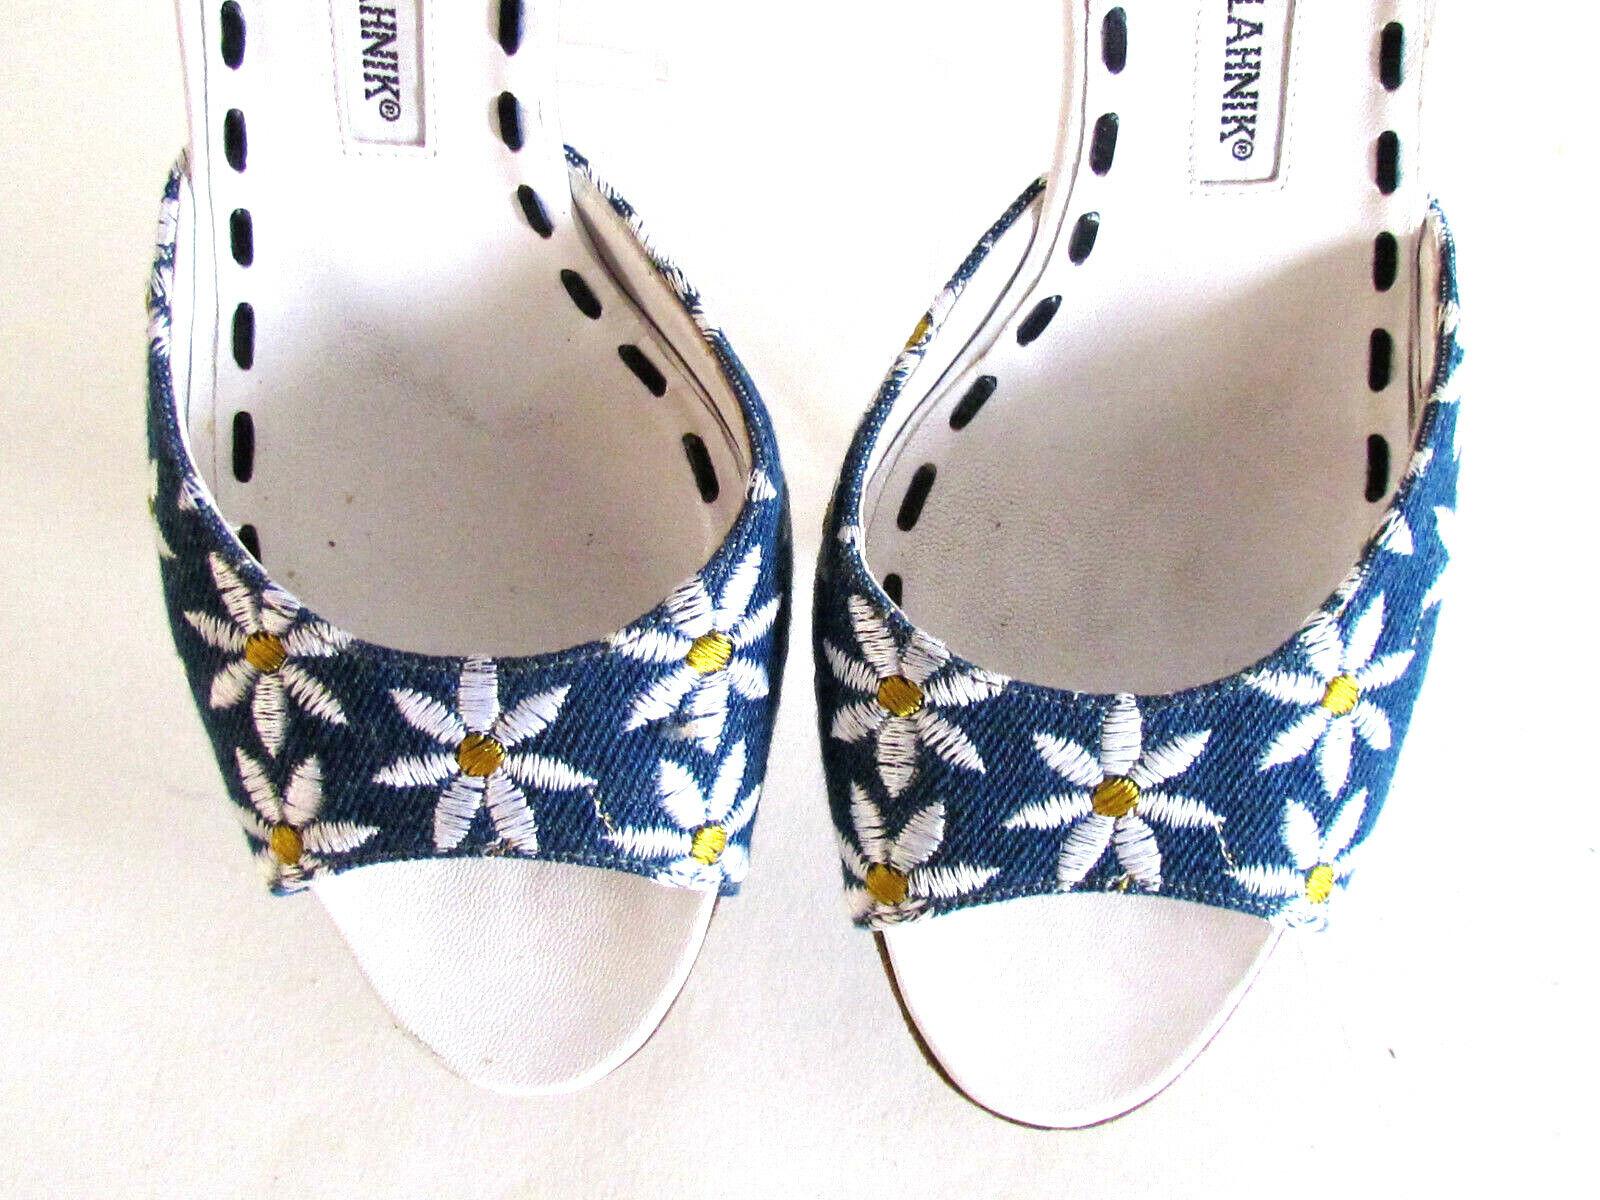 Donna  scarpe Heels Designer Manolo Blahnik blu blu blu bianca Floral Print Sandals 8.5 218a2a